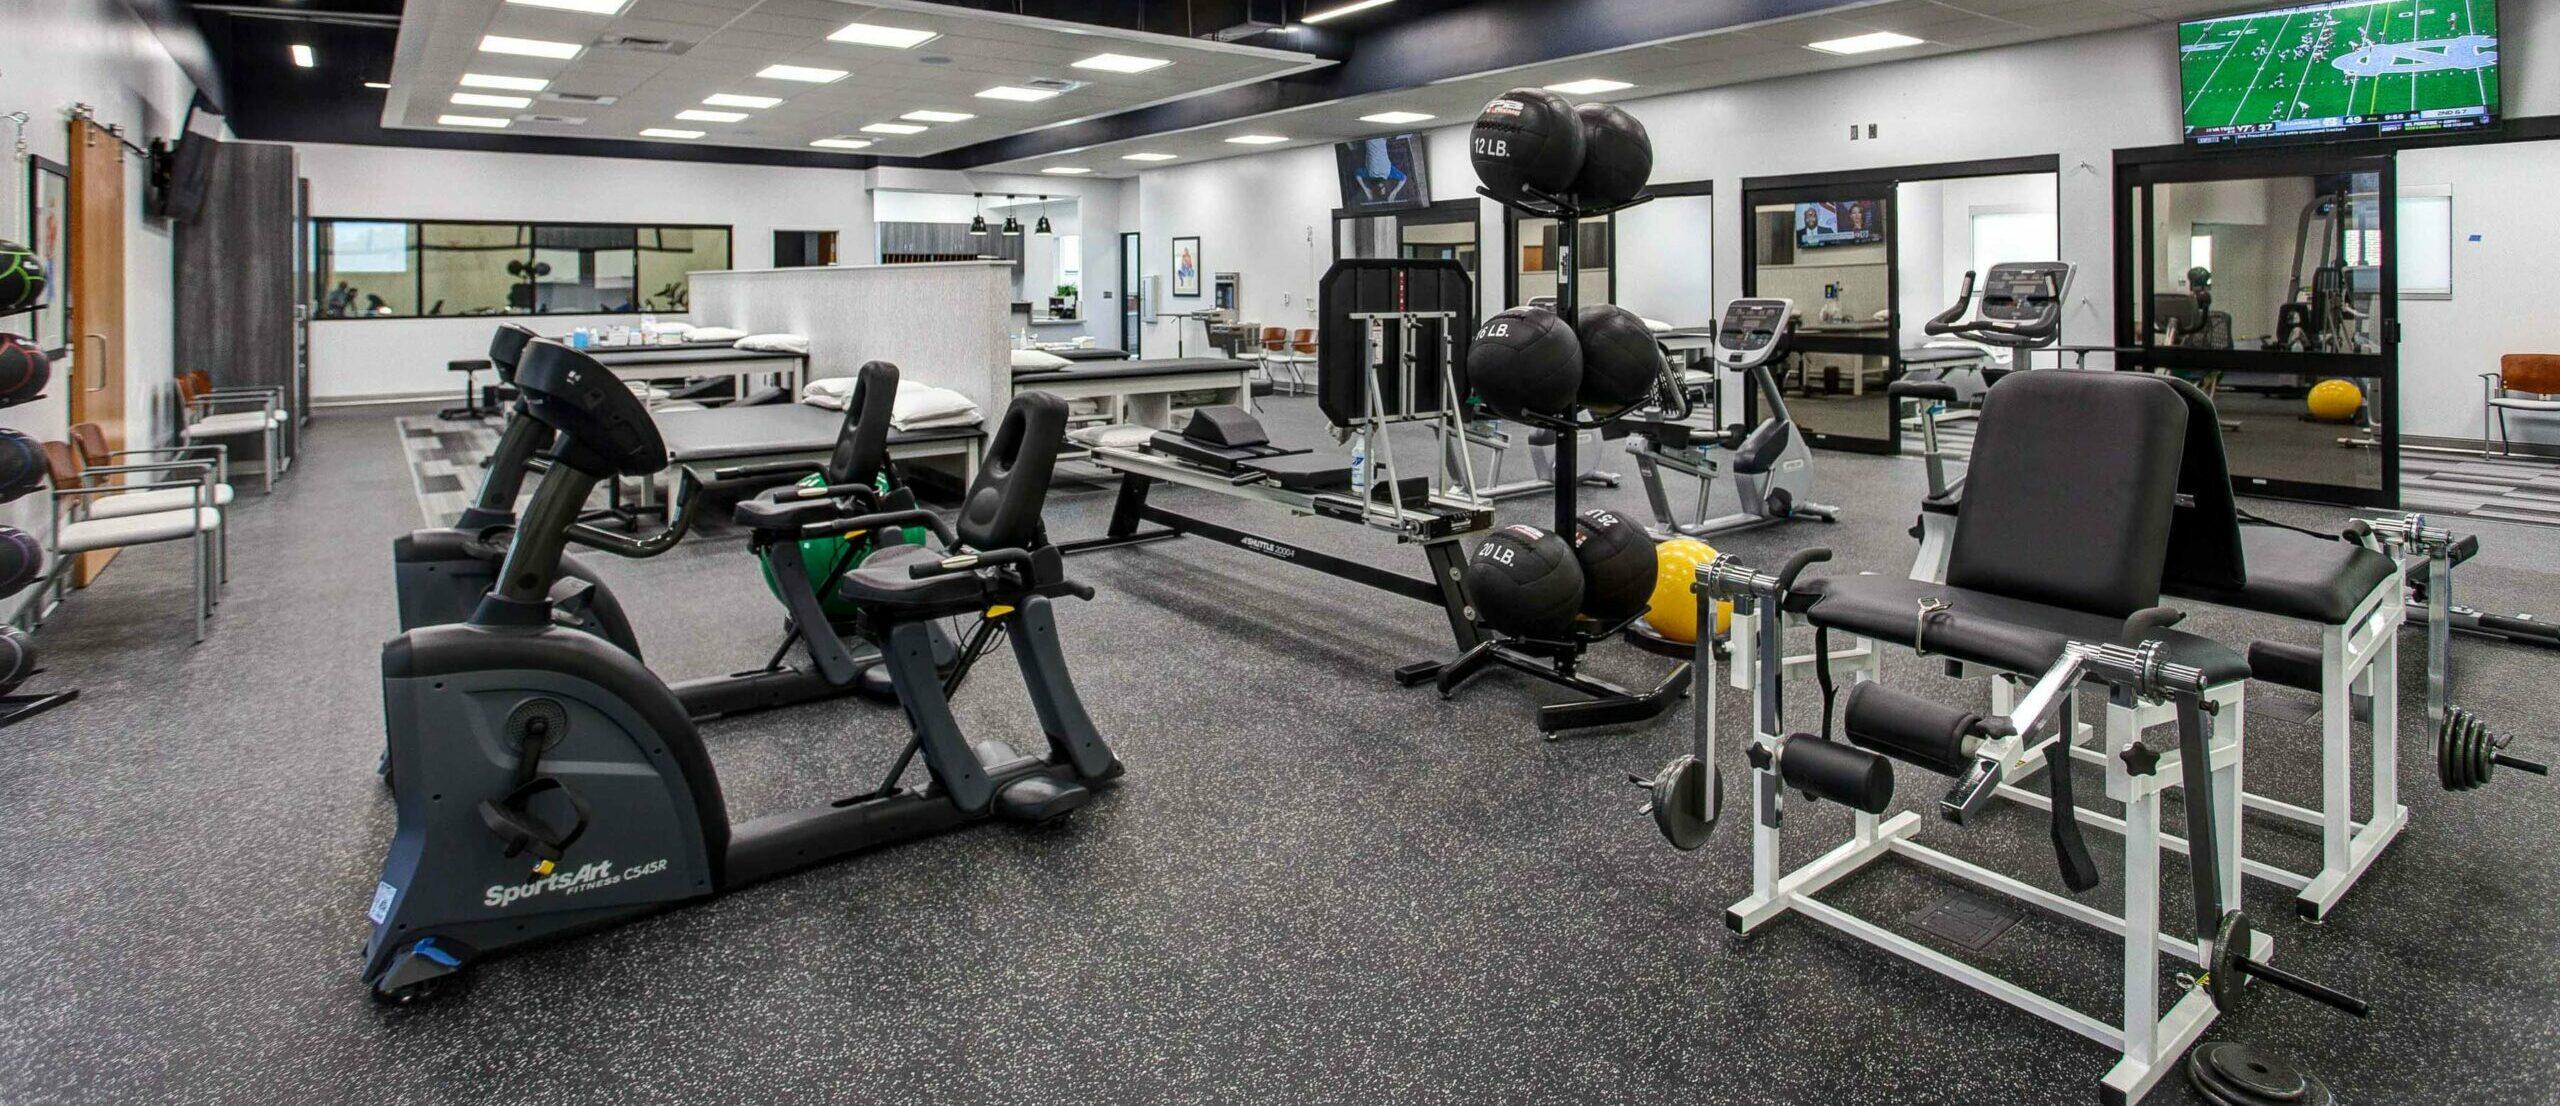 Orthopaedic & Sports Medicine Center